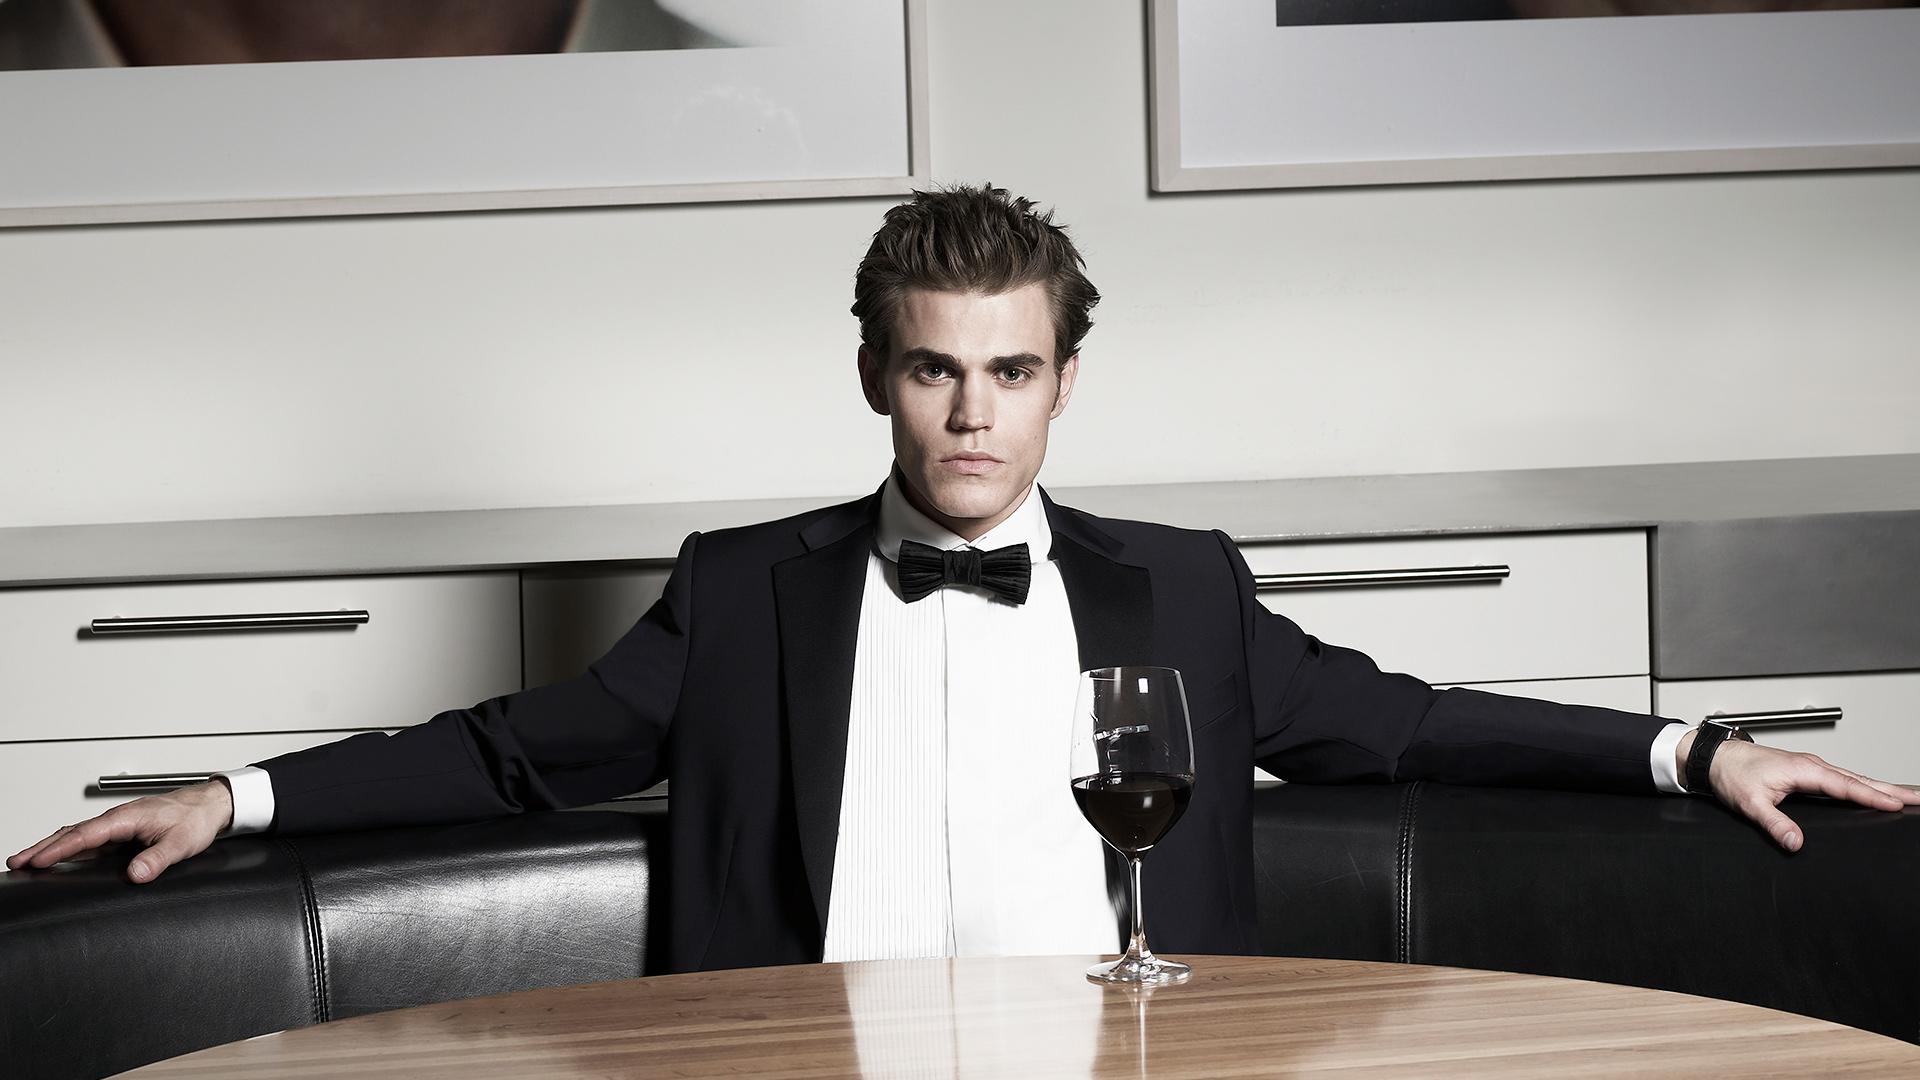 One handsome guy in black tie